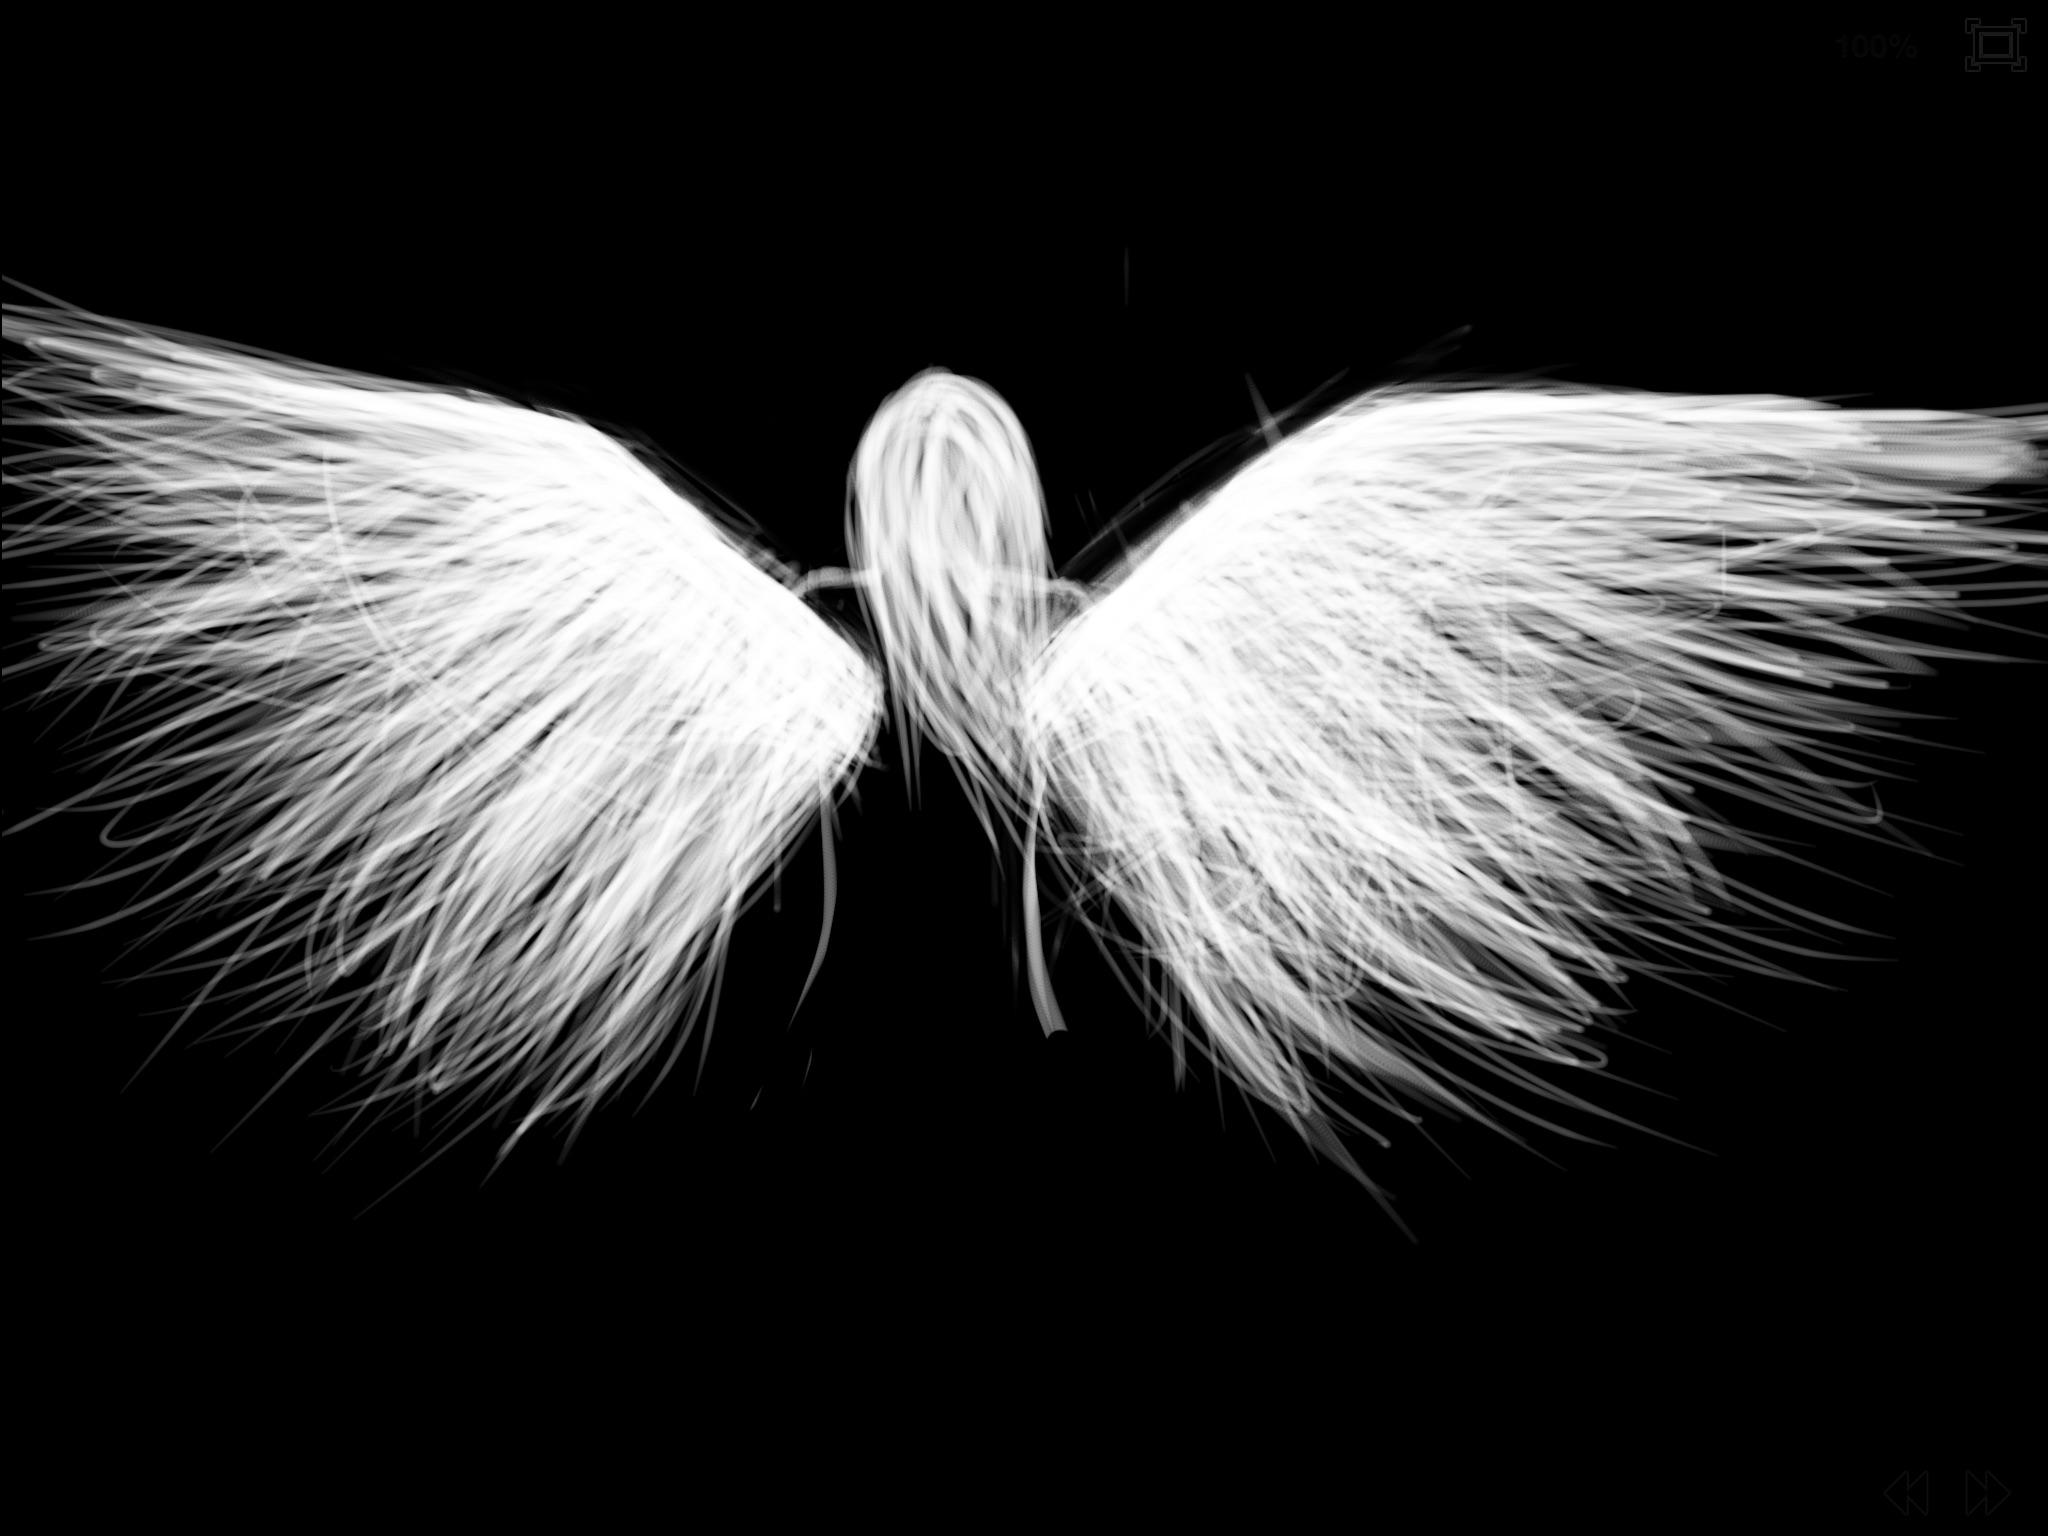 Angel Wings by AudiaTox on DeviantArt